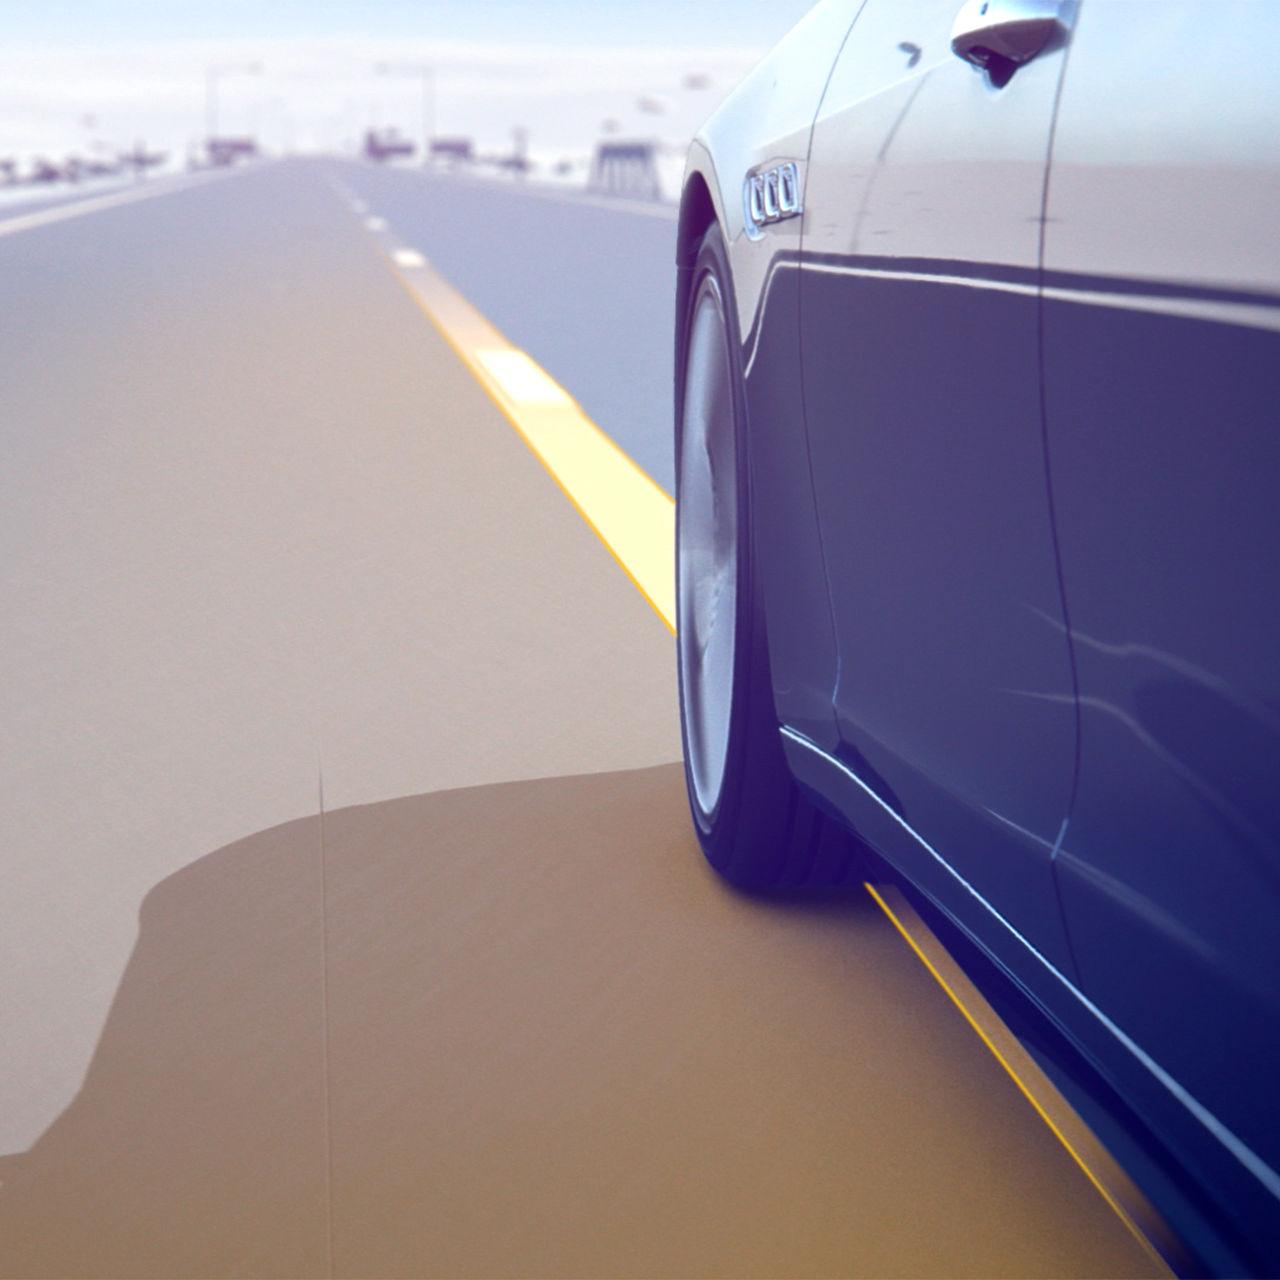 Maserati Lane Keeping Assist System